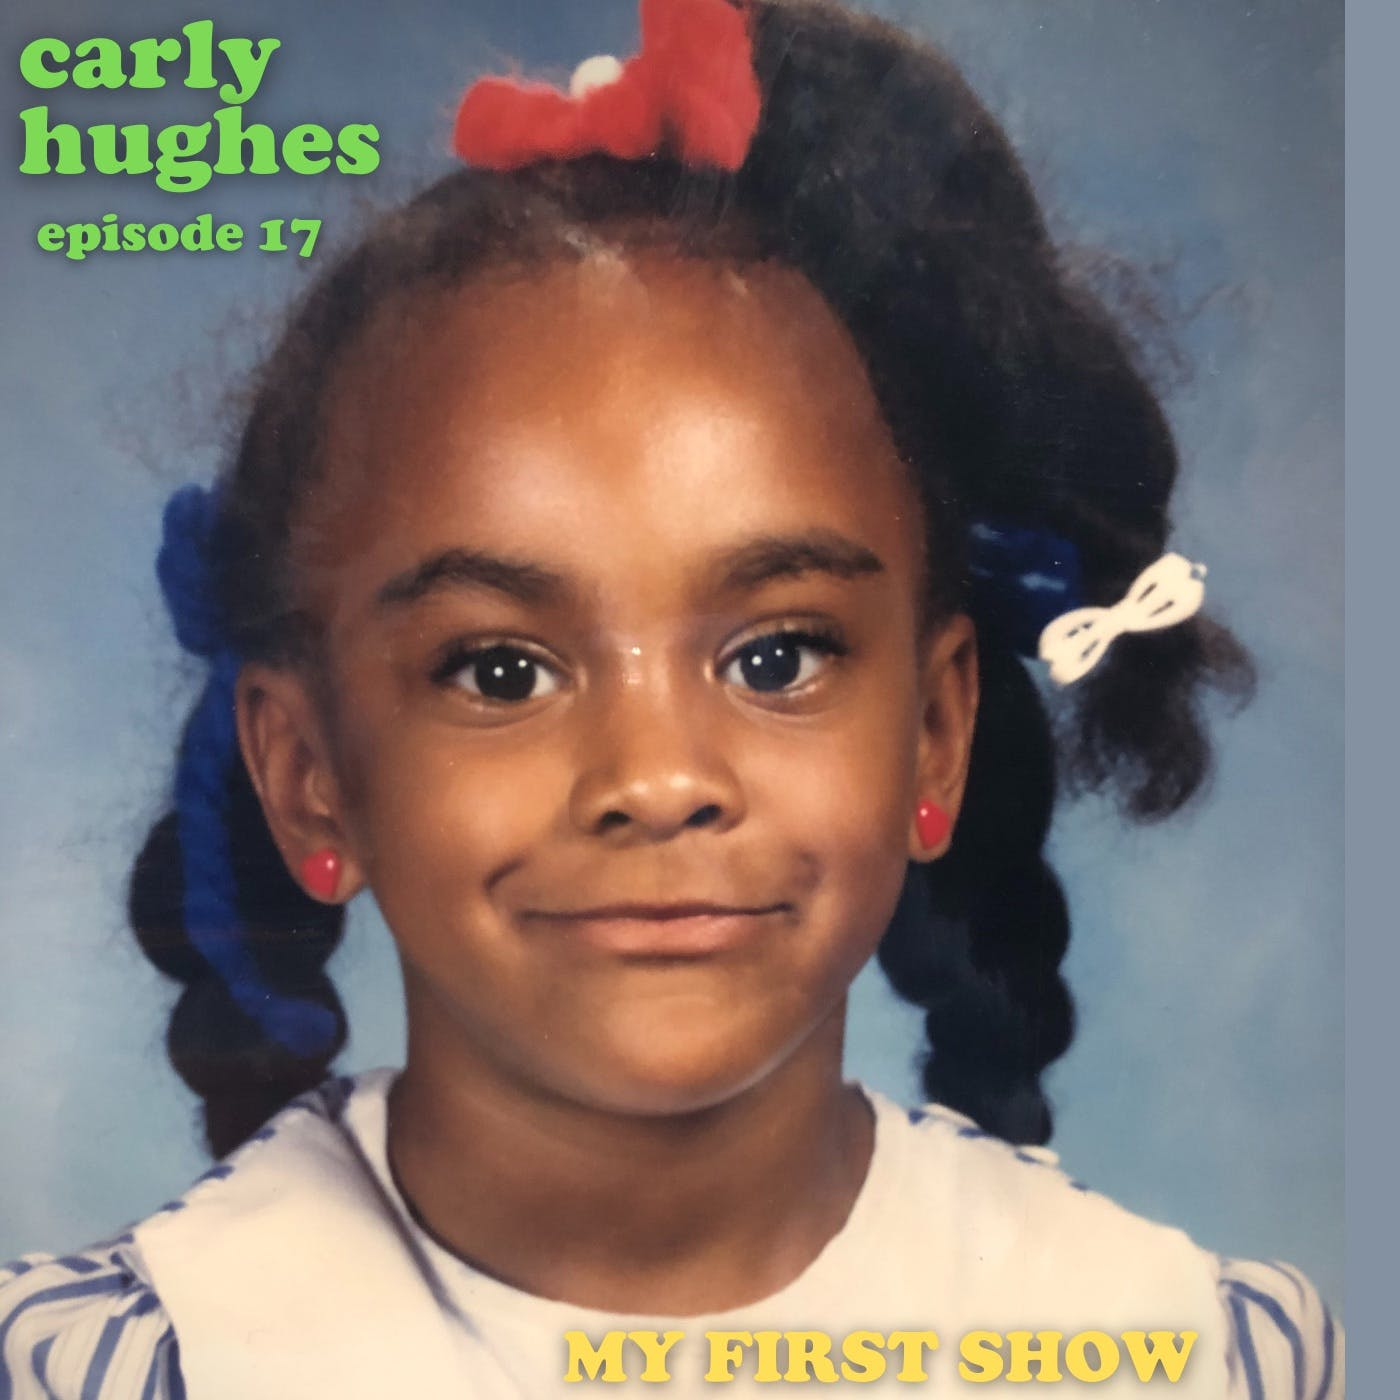 S1/Ep17: Carly Hughes